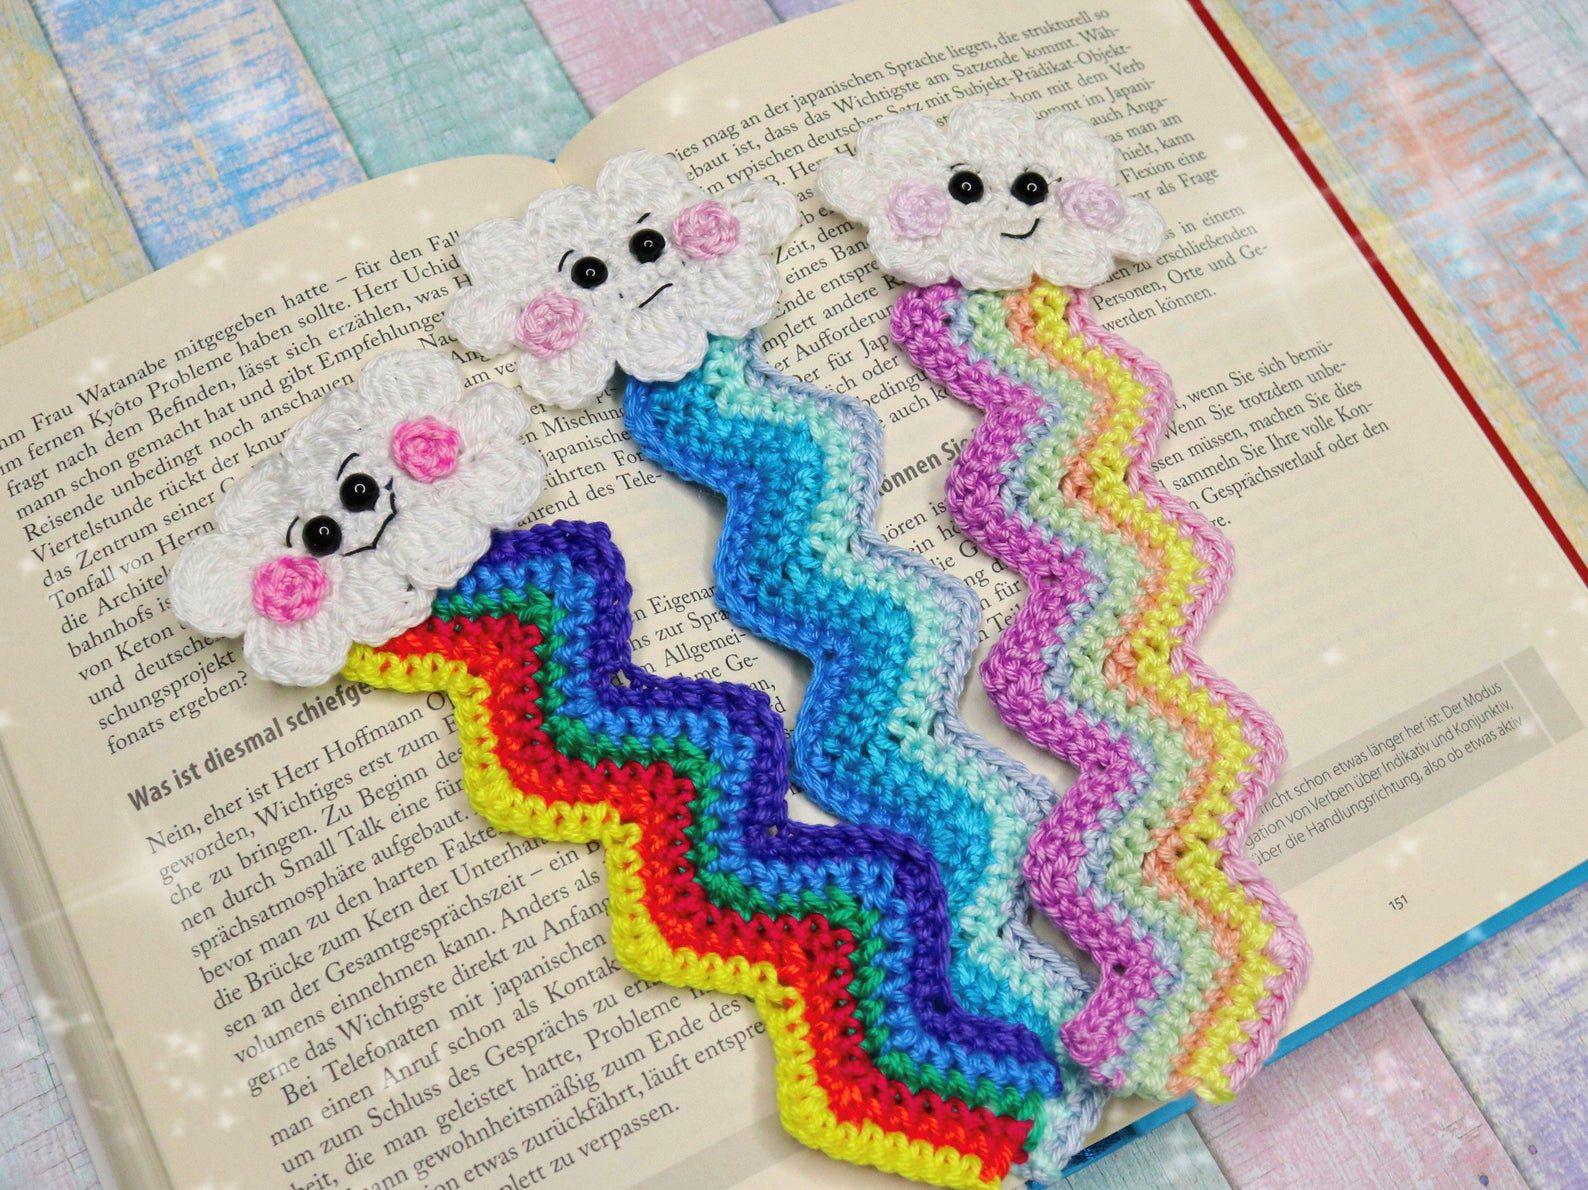 DIY etsy cloud crochet bookmark pattern